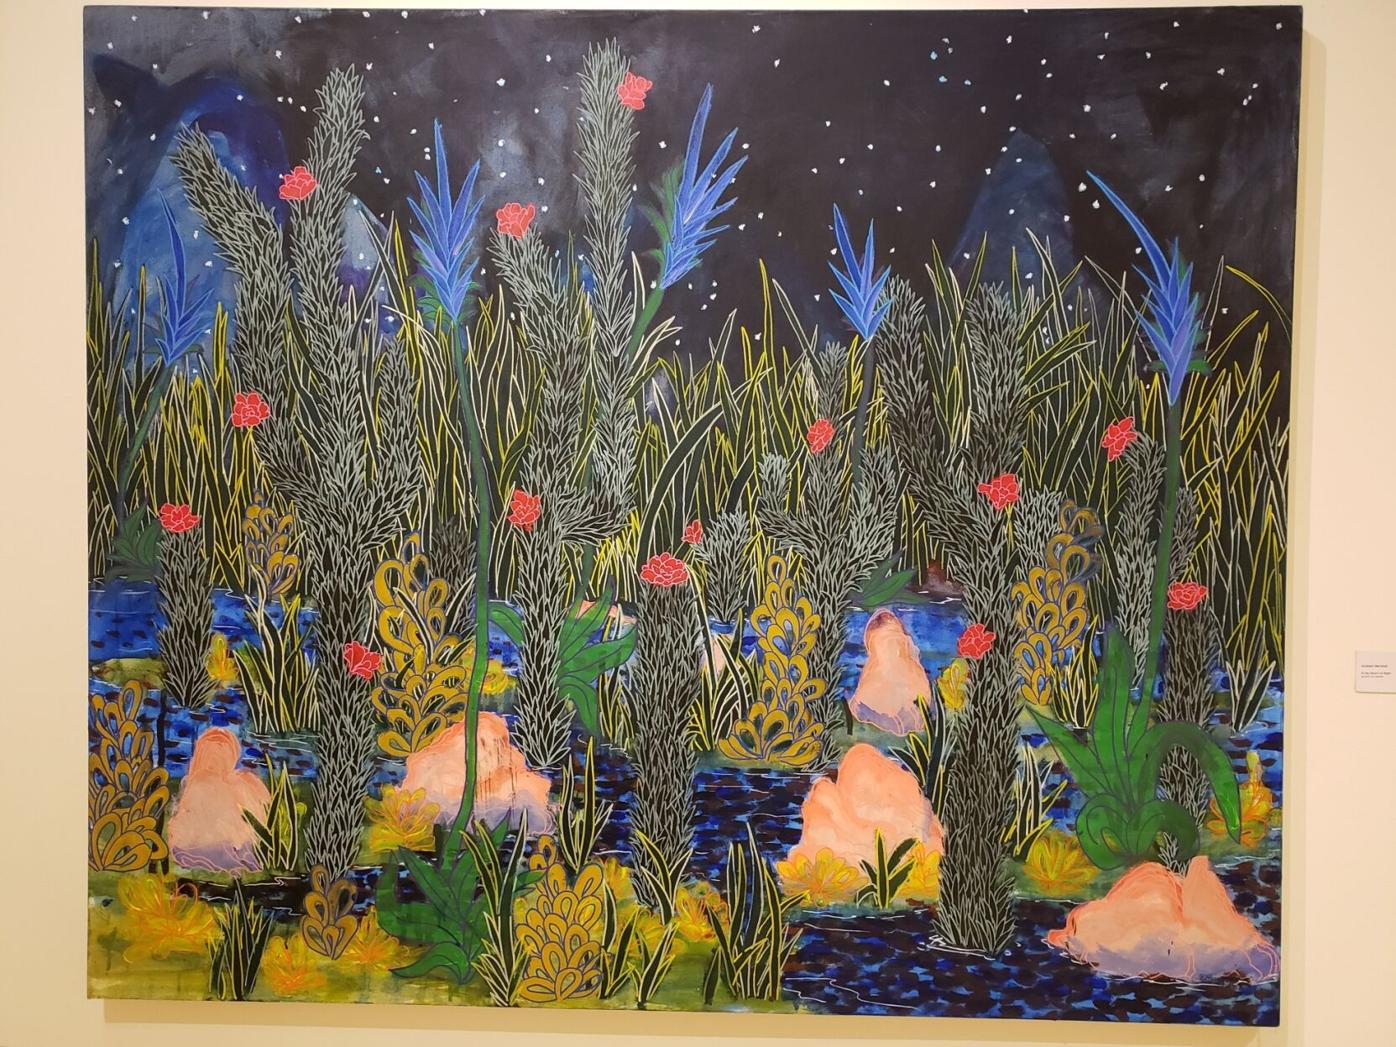 """Desert at Night"" by Graham Marshall (acrylic on canvas)"